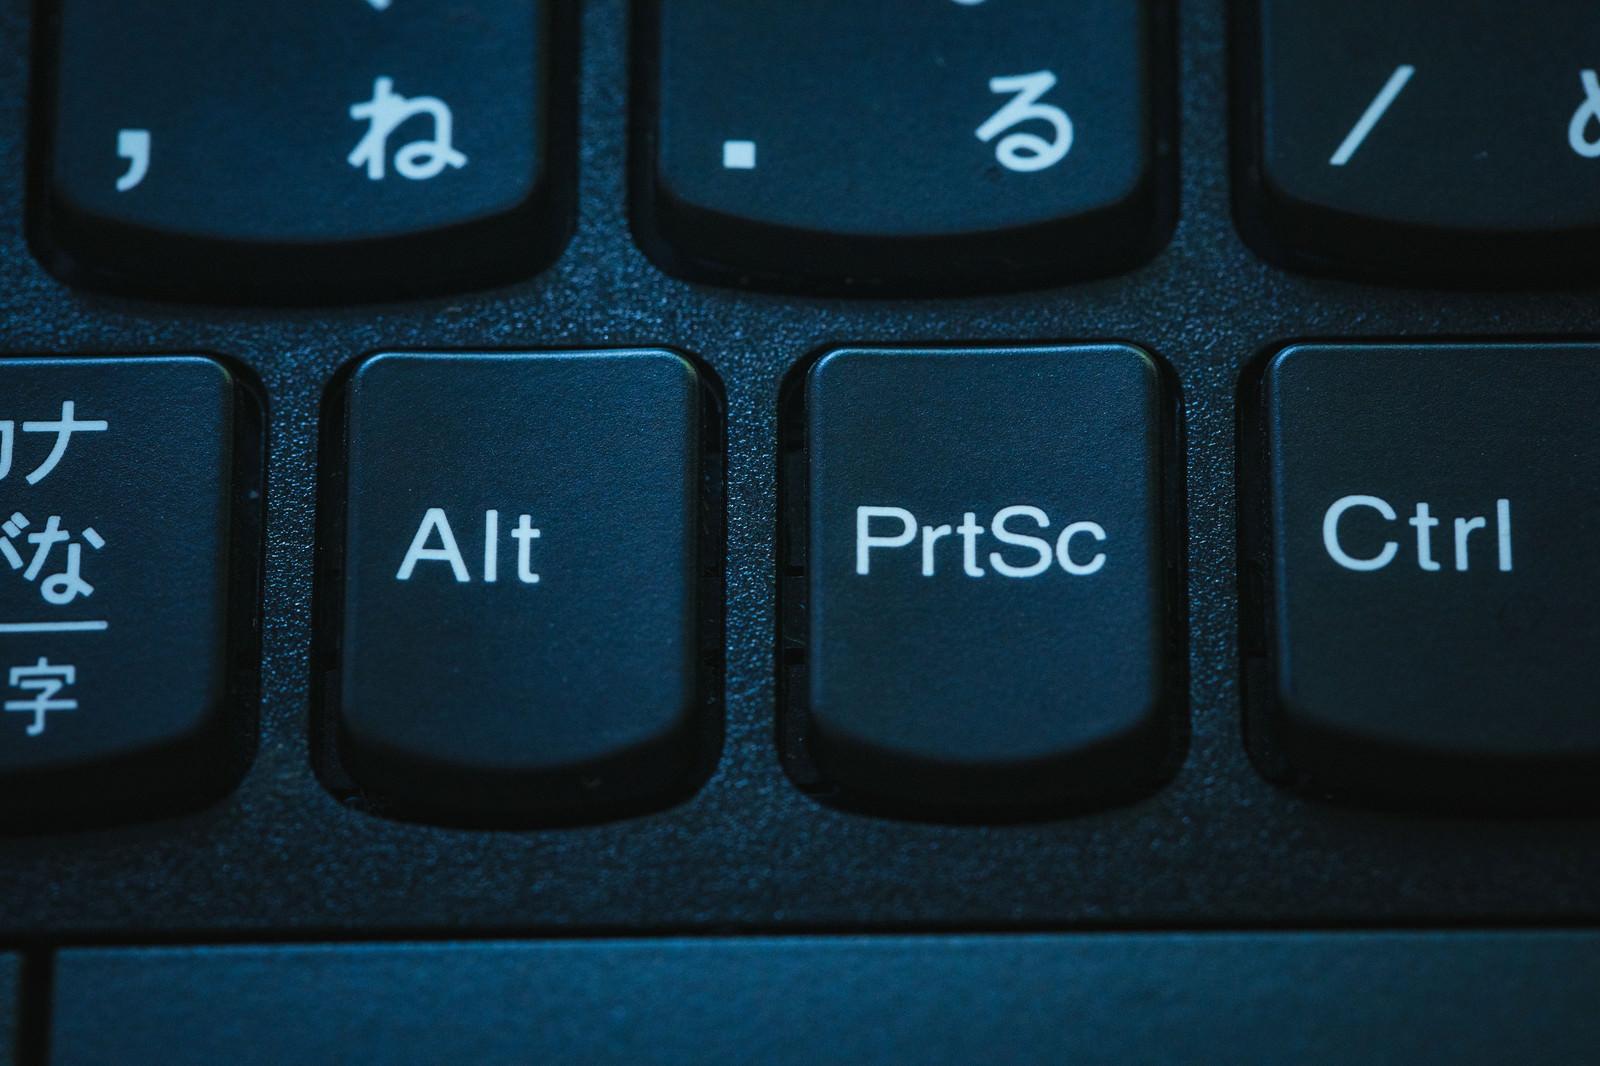 「PrtSc(プリントスクリーンボタン)」の写真